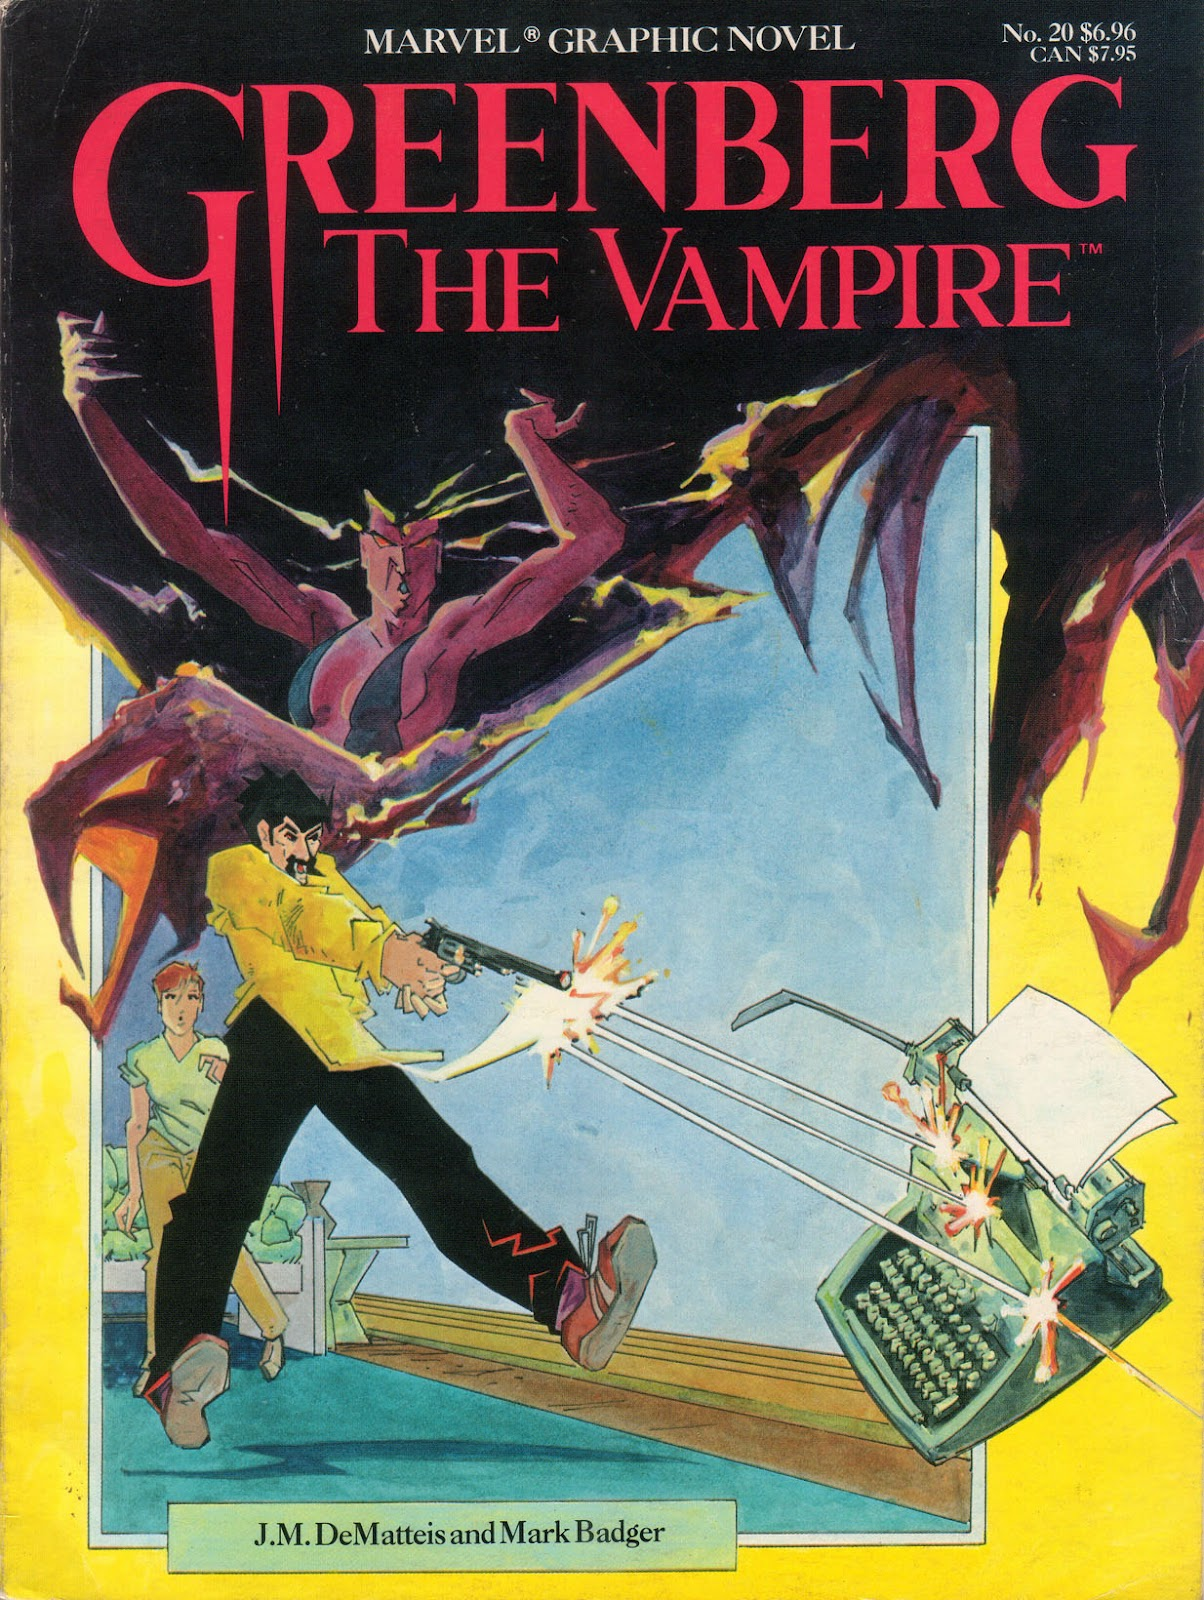 Marvel Graphic Novel 20_-_Greenberg_the_Vampire Page 1